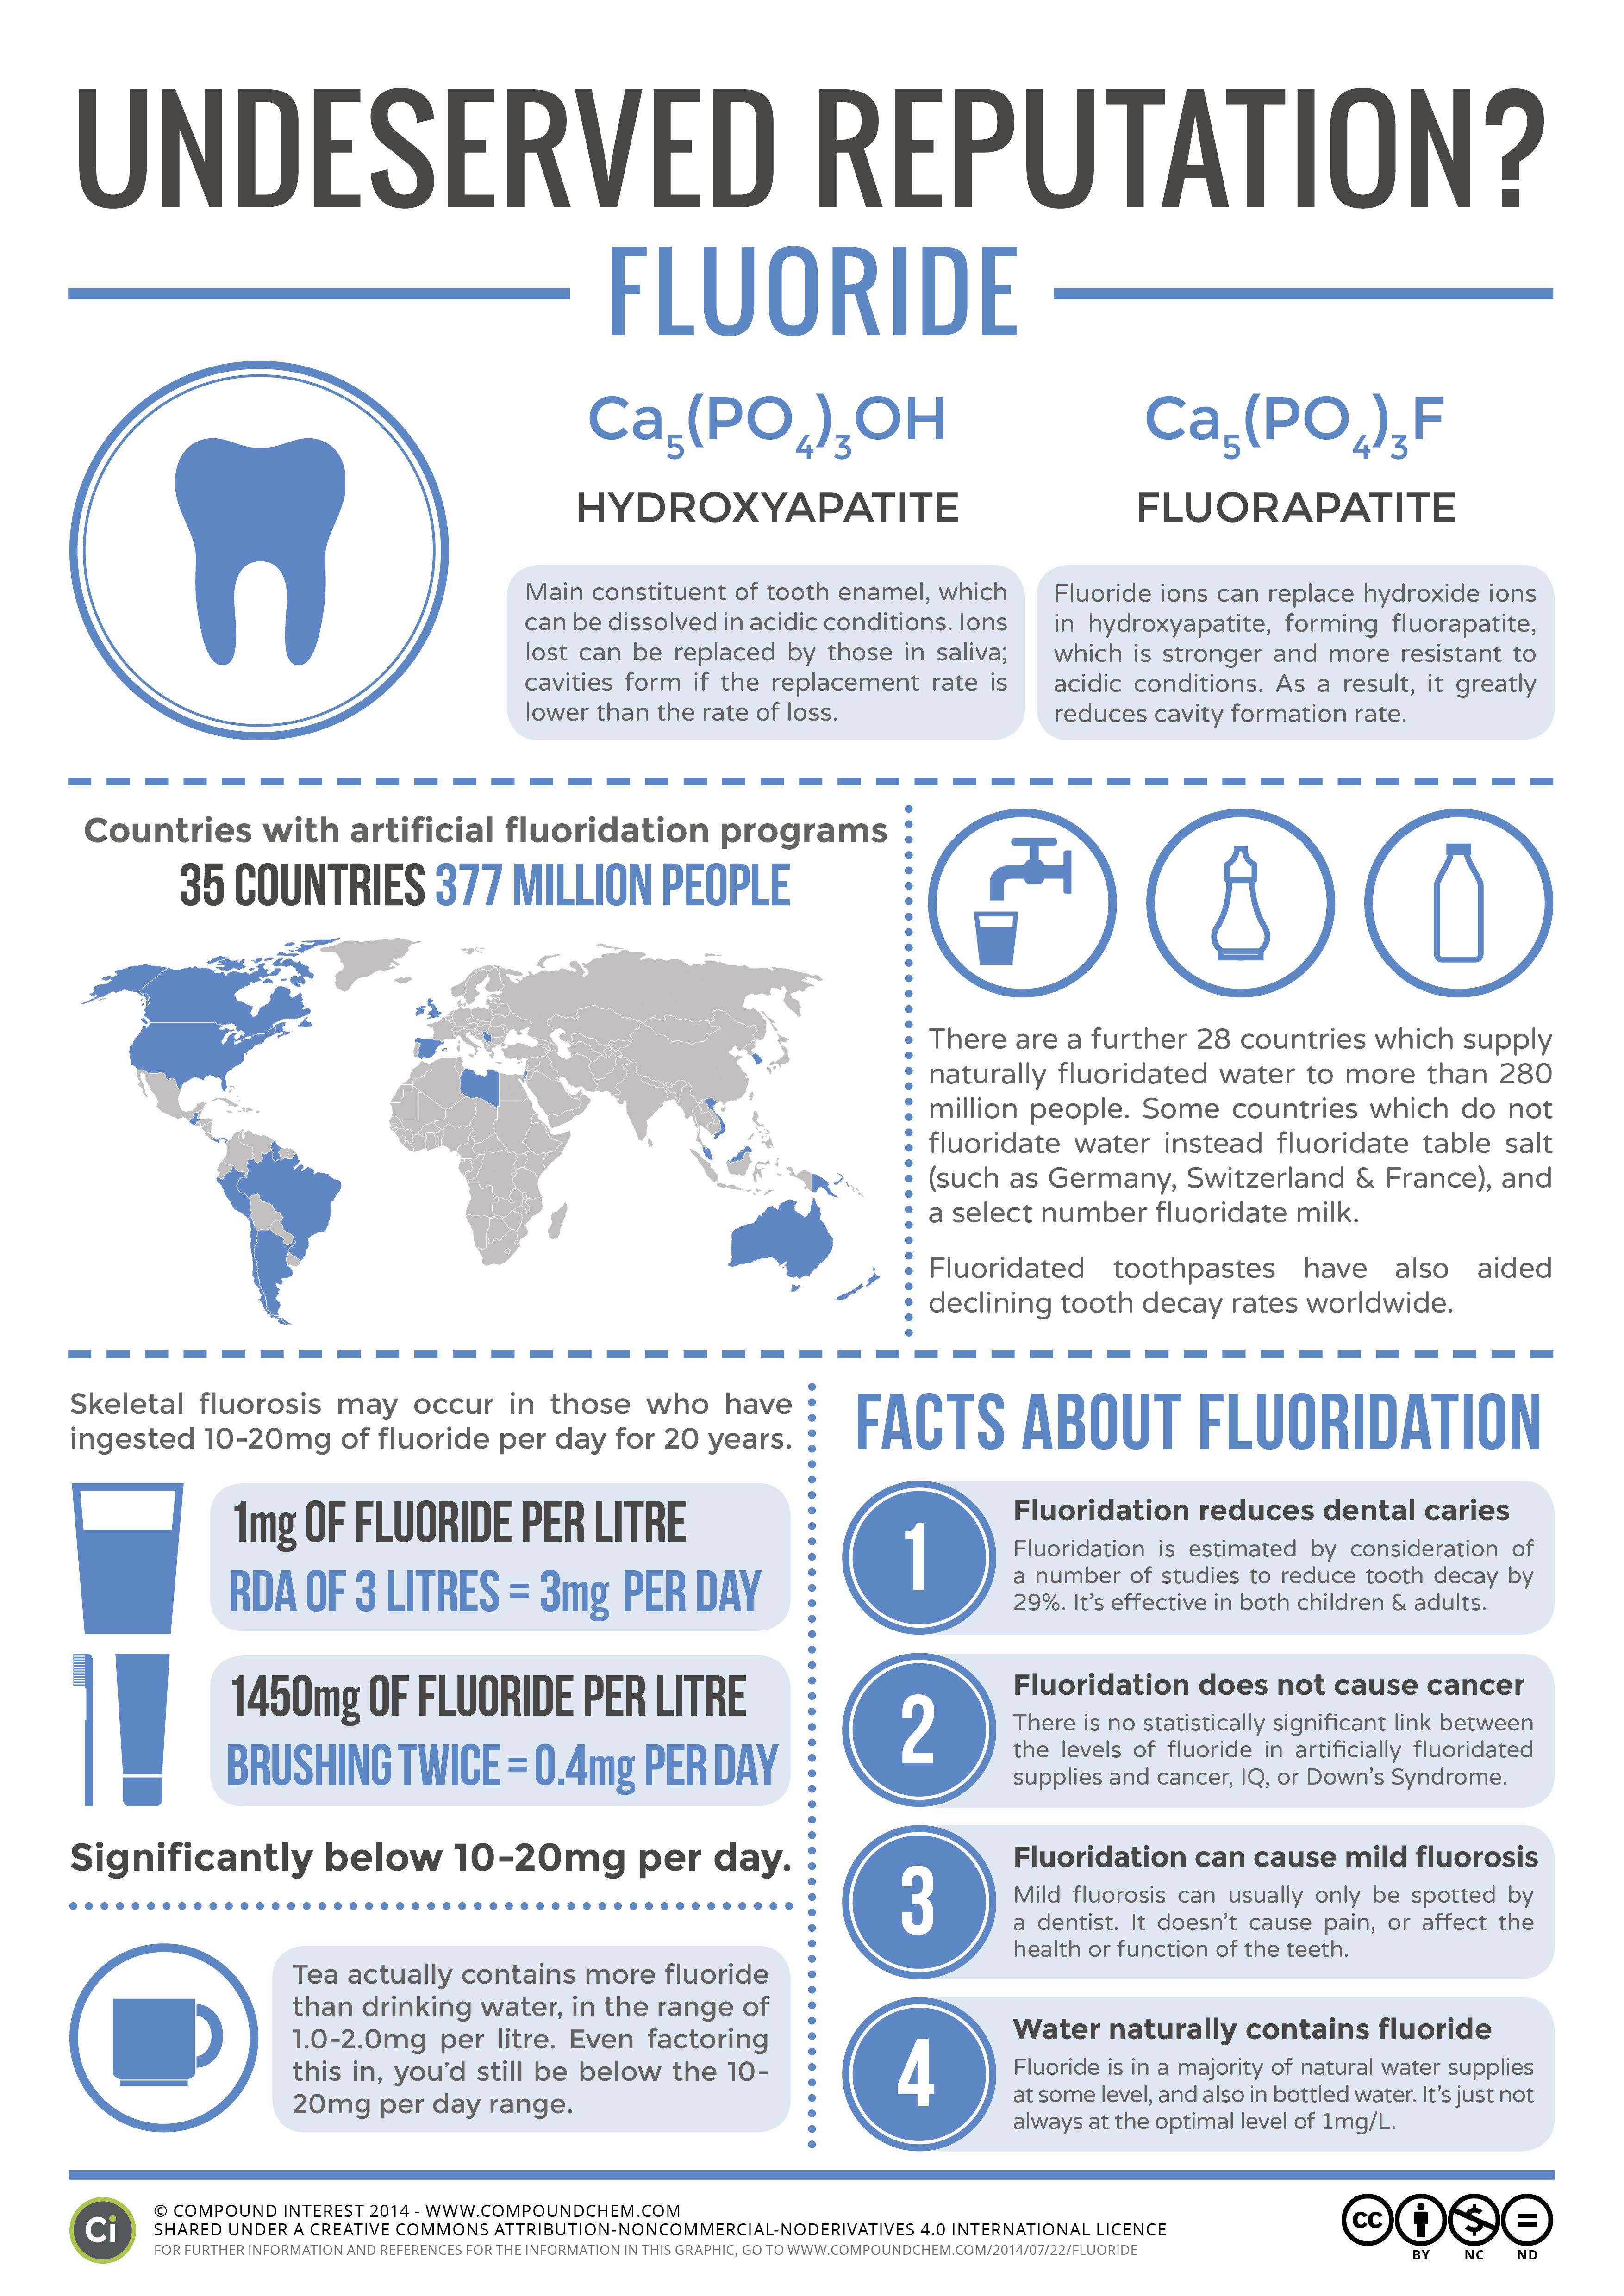 Fluoride & Water Fluoridation – An Undeserved Reputation